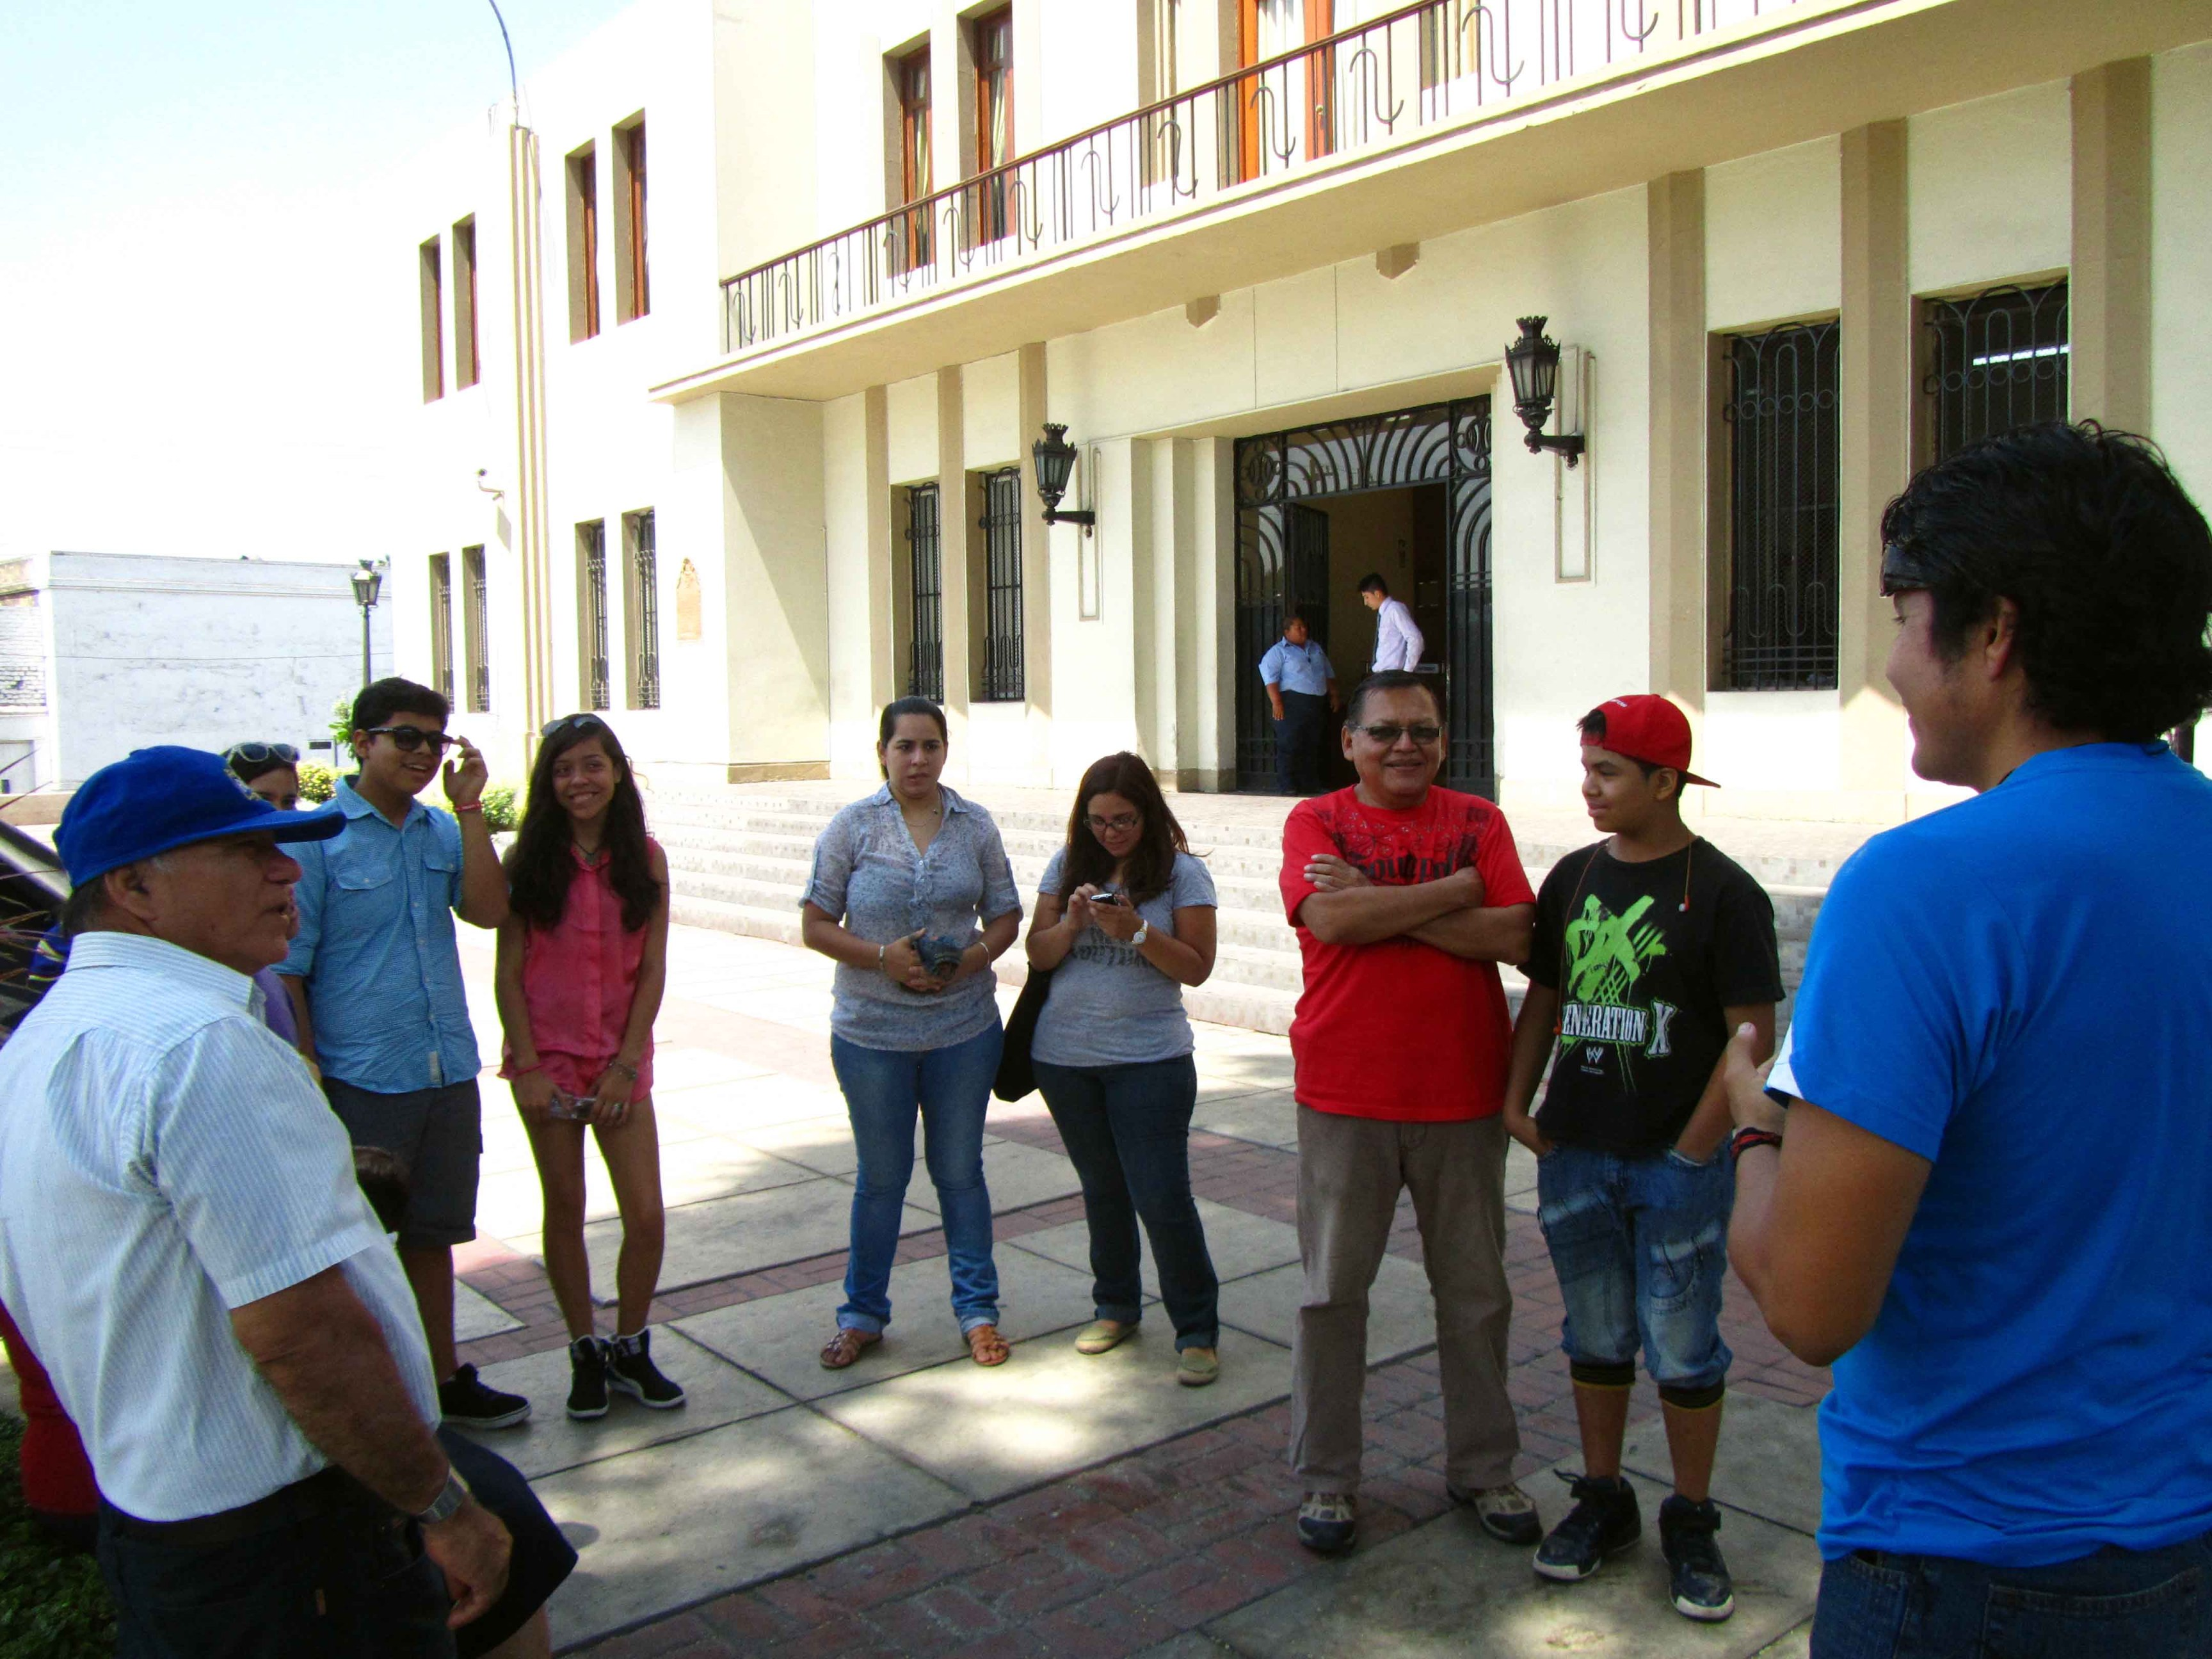 Con nuestro guía antes de iniciar el tour. With our guide before the tour begins. Photo credit, placeOK